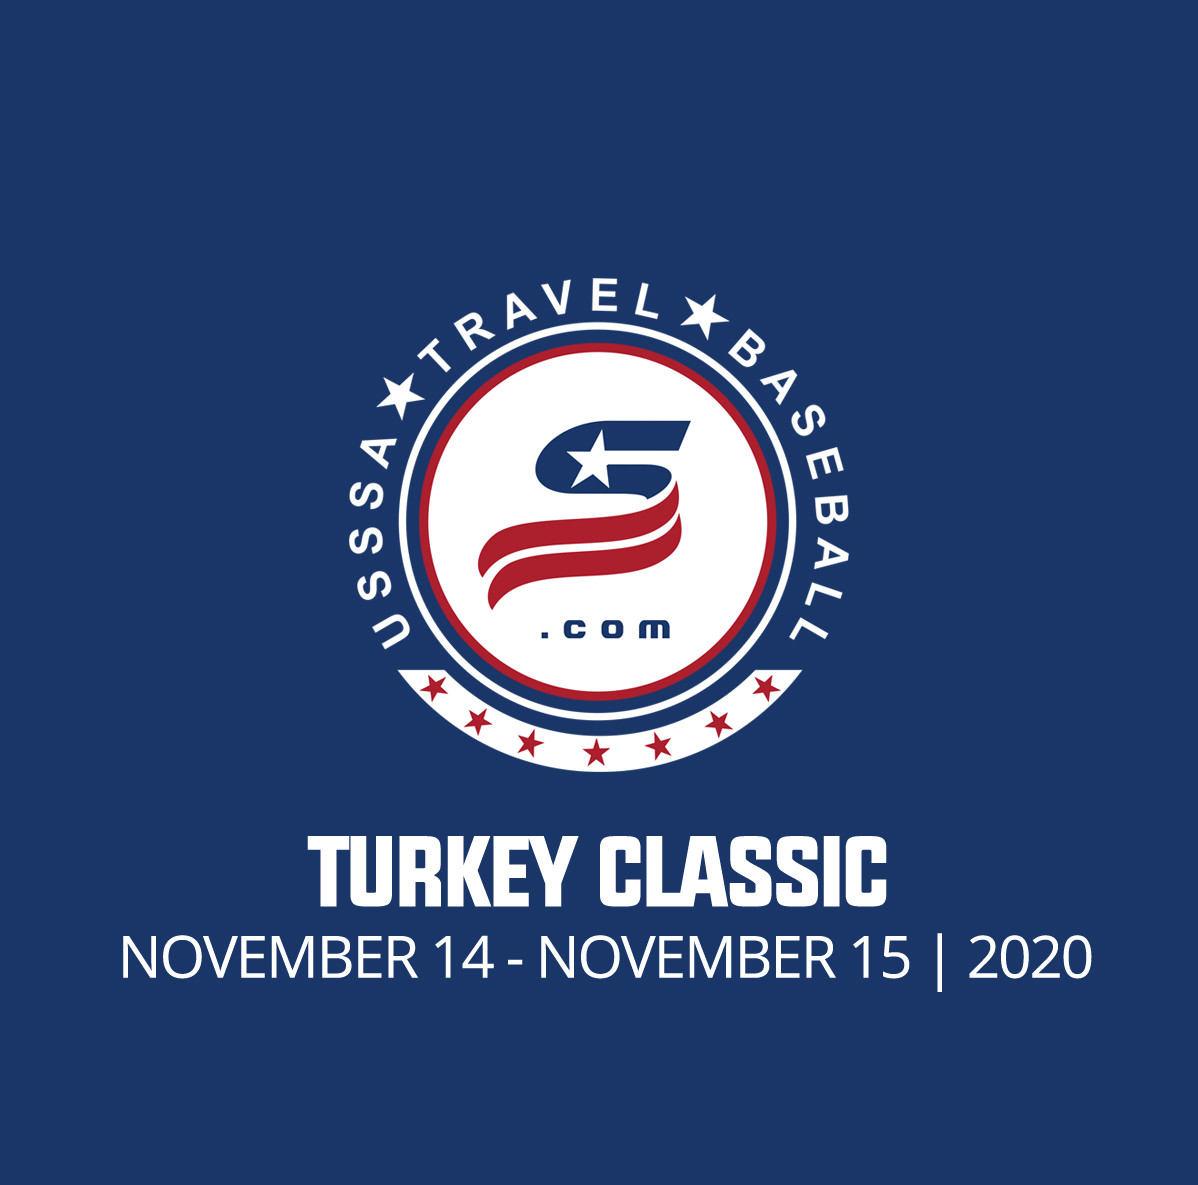 UPSTATE - TURKEY CLASSIC